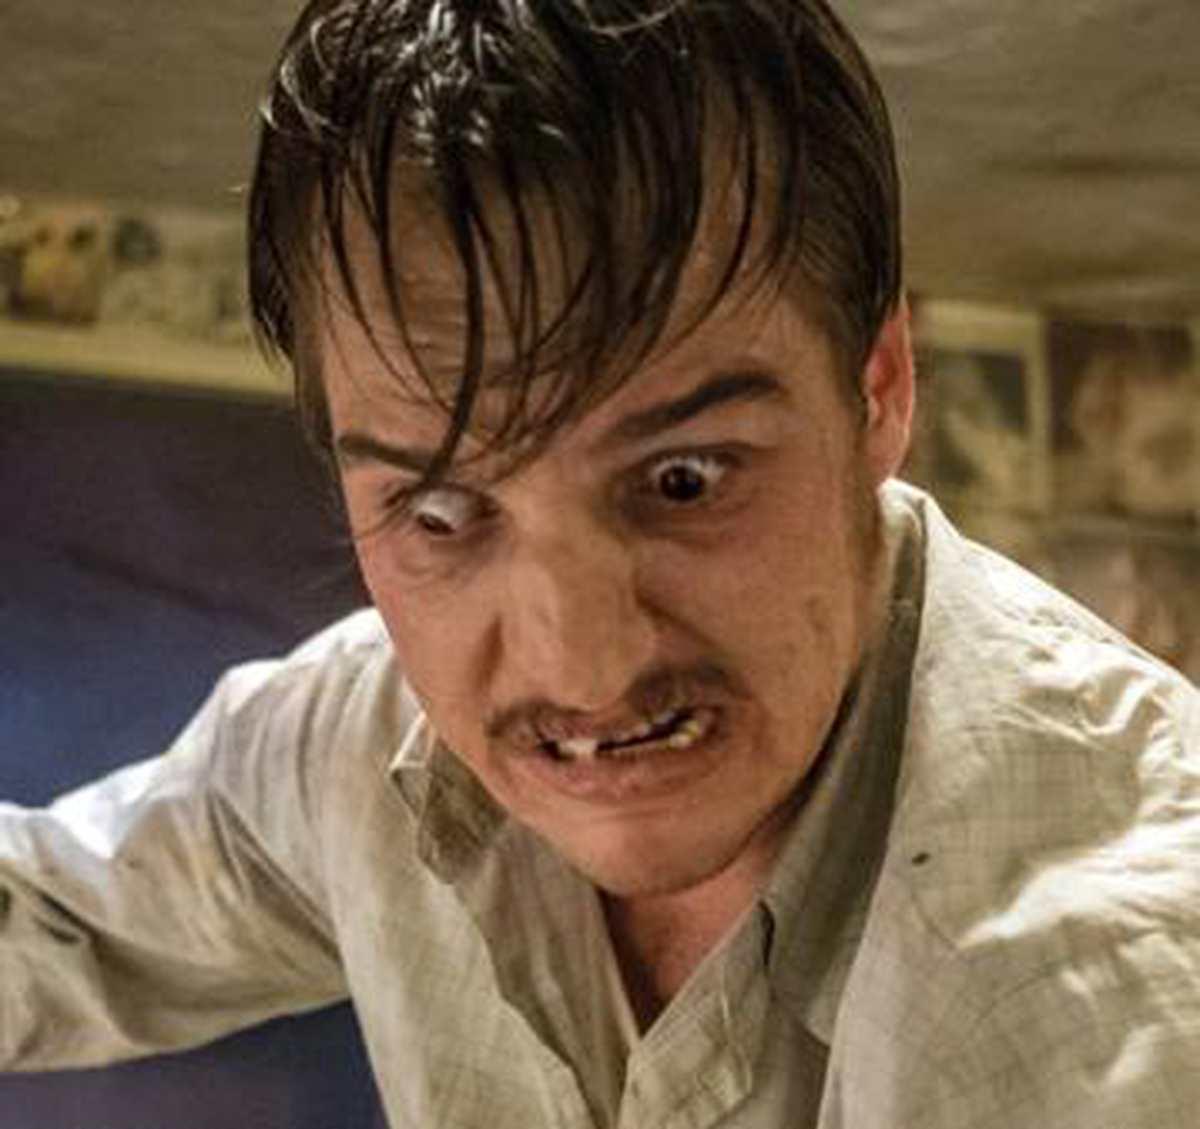 Kino Alkoholexzesse statt übler Gewaltorgie